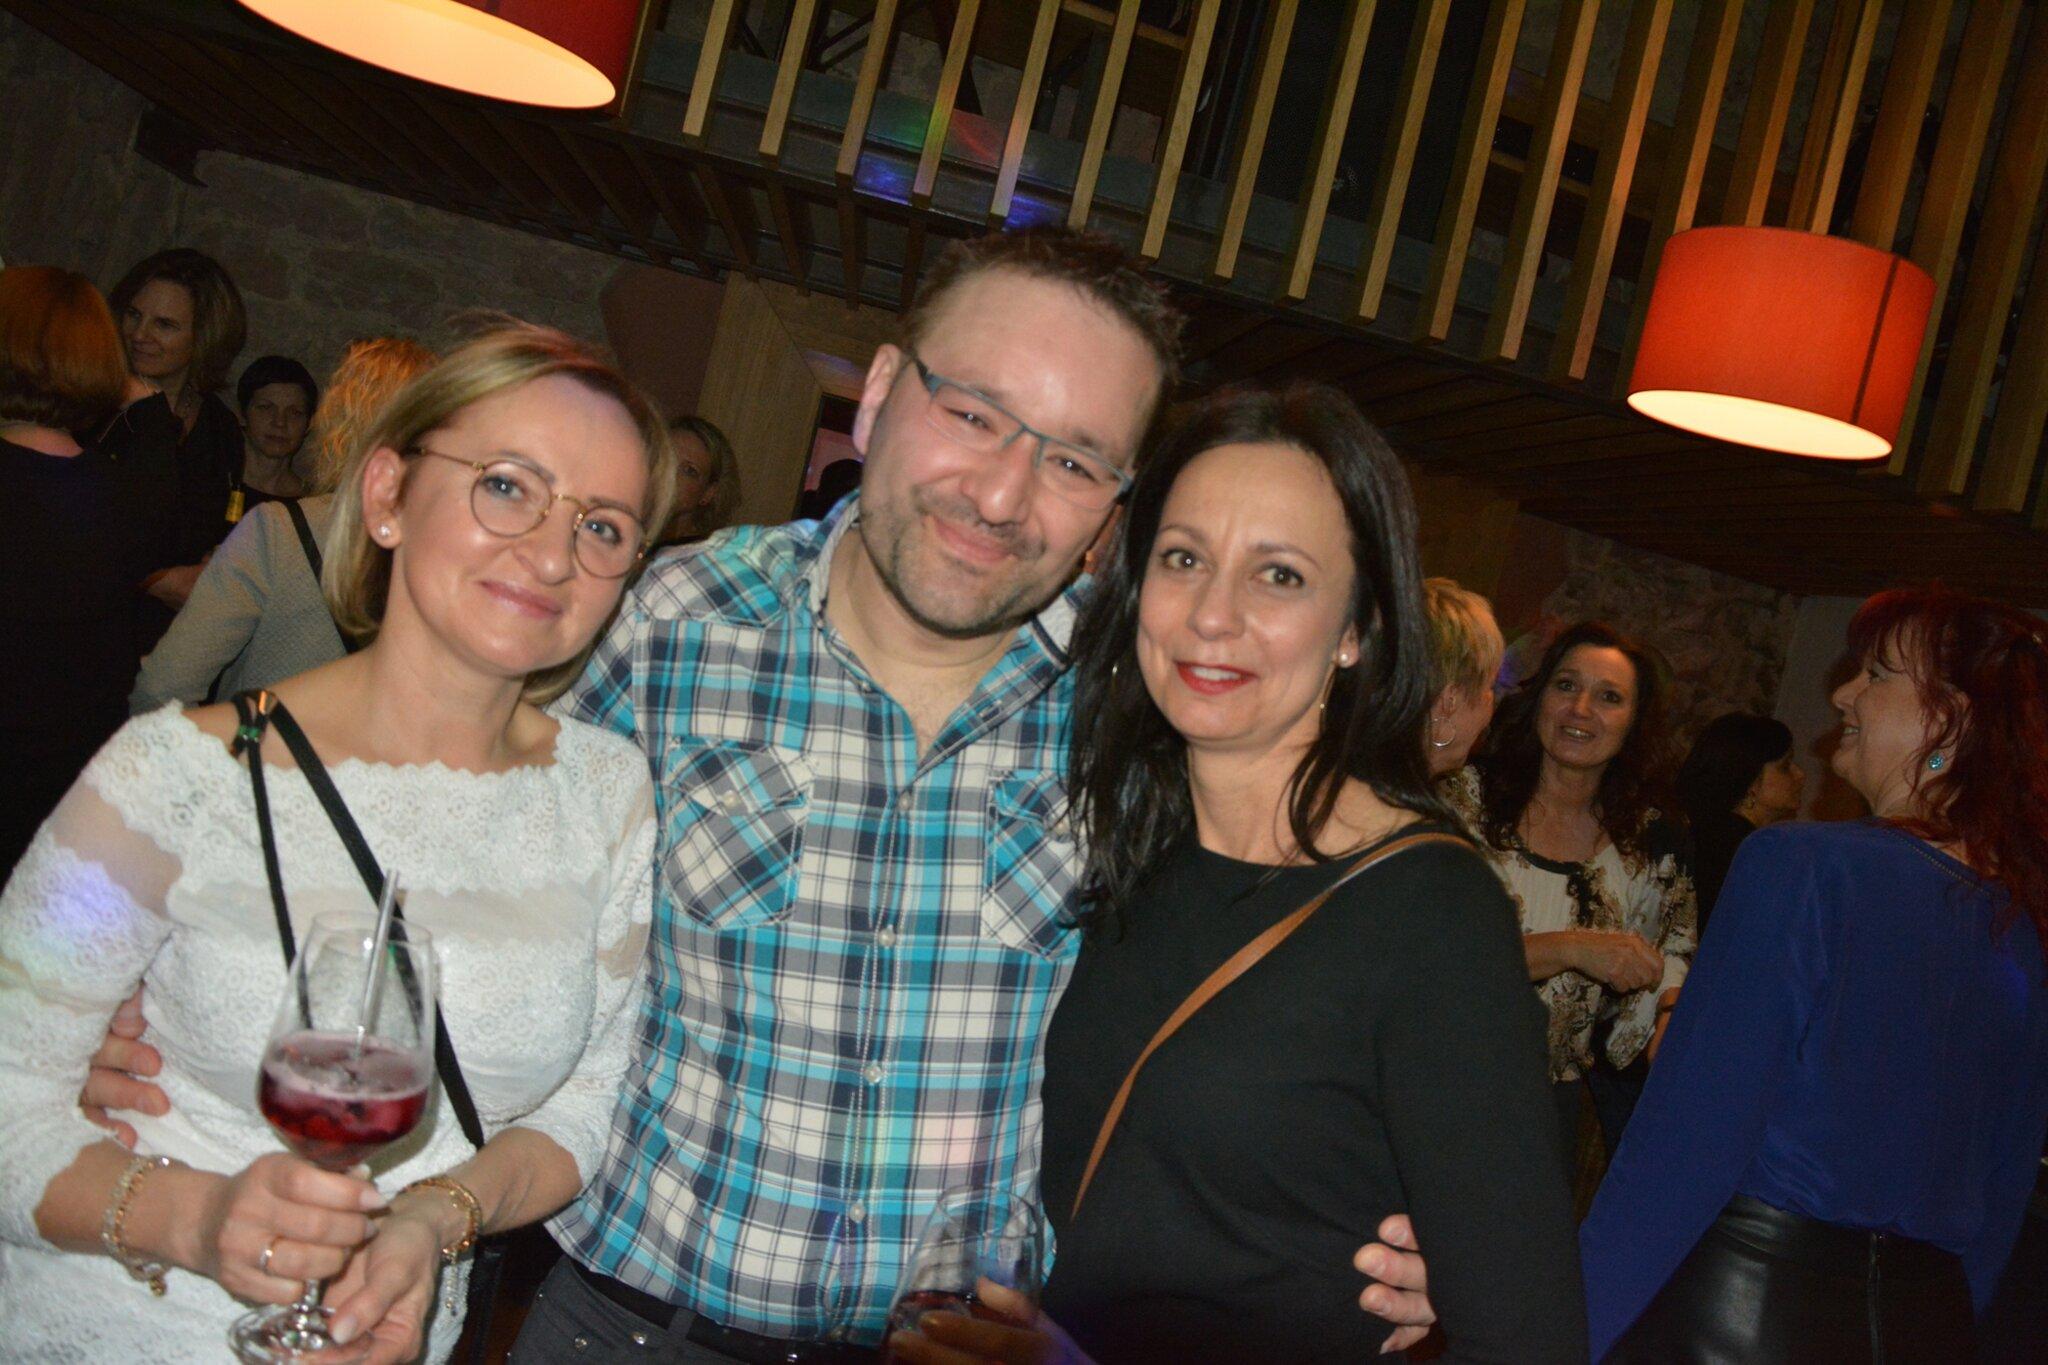 Keller-Musik-30-Party-im-Ebert-Keller-Klingenberg-vor-einem-Jahr